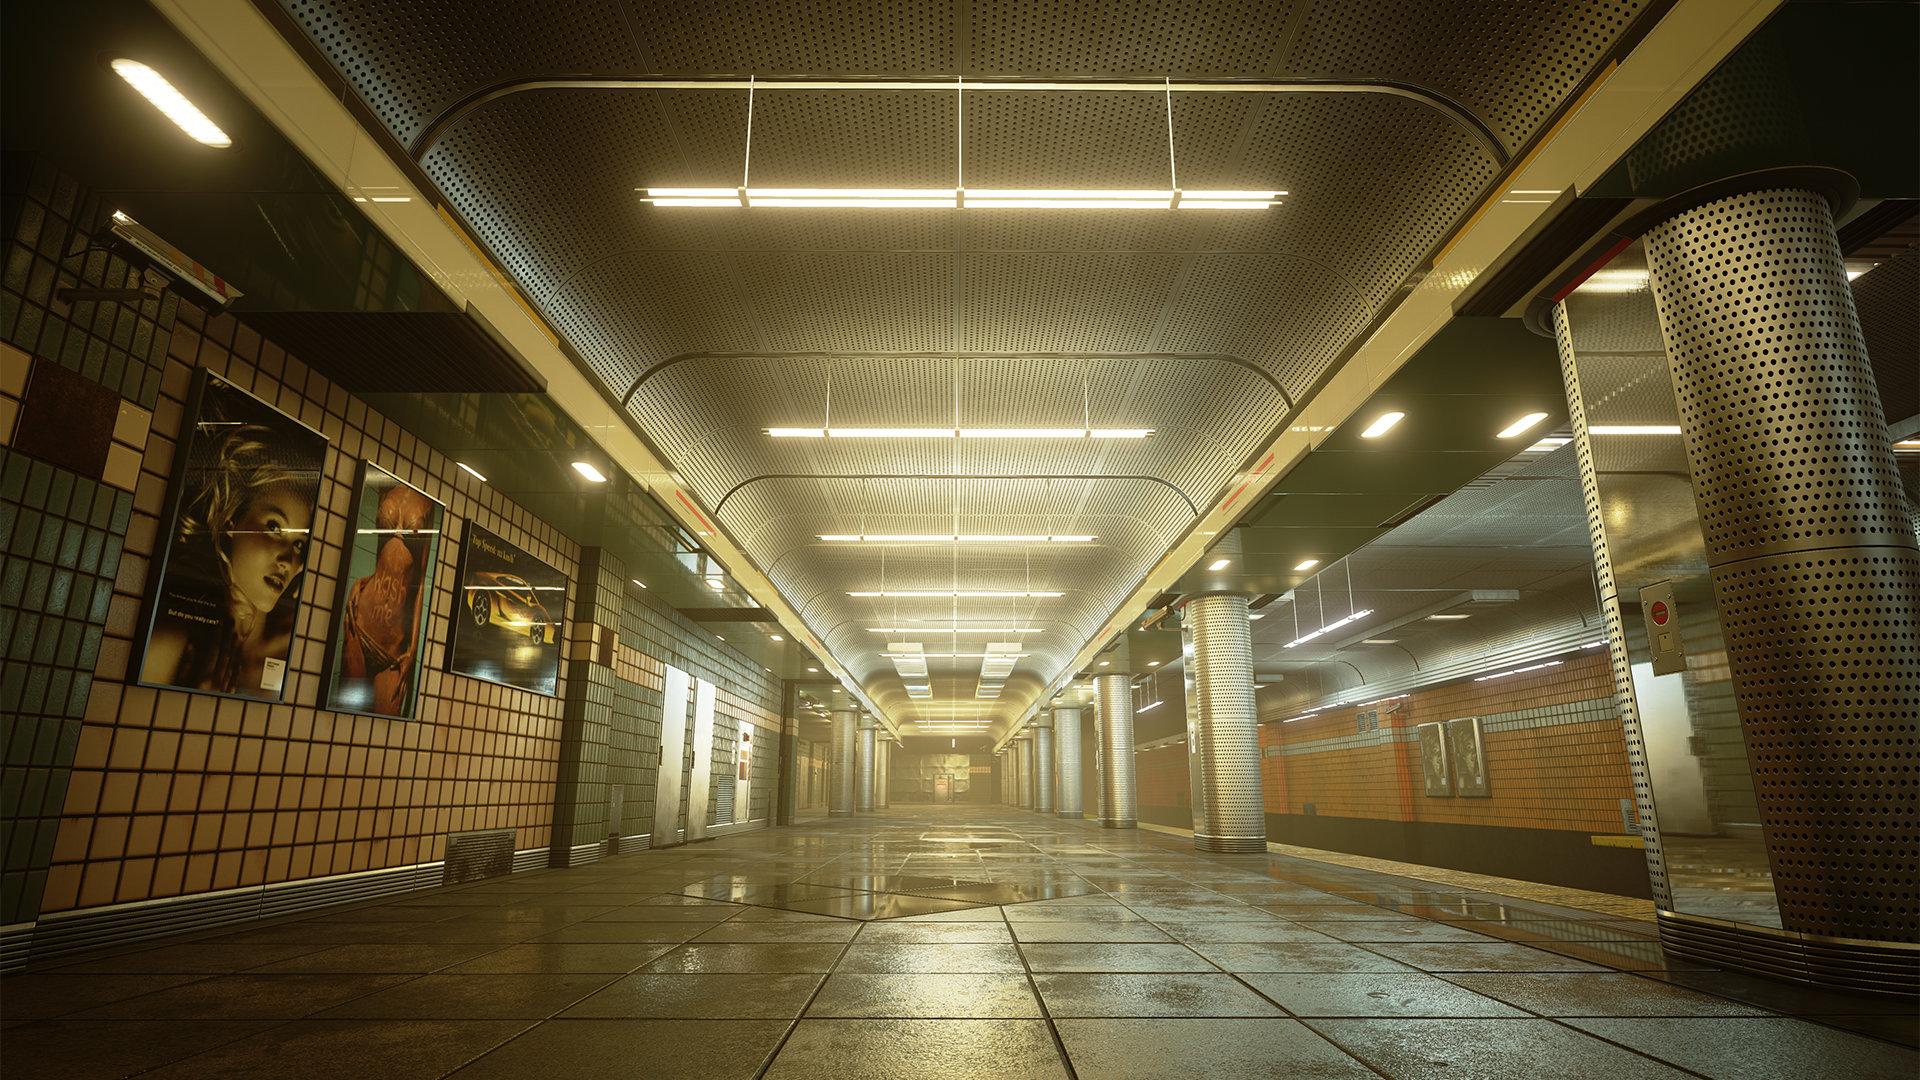 marcel-gonzales-subway01.jpg?1437580955